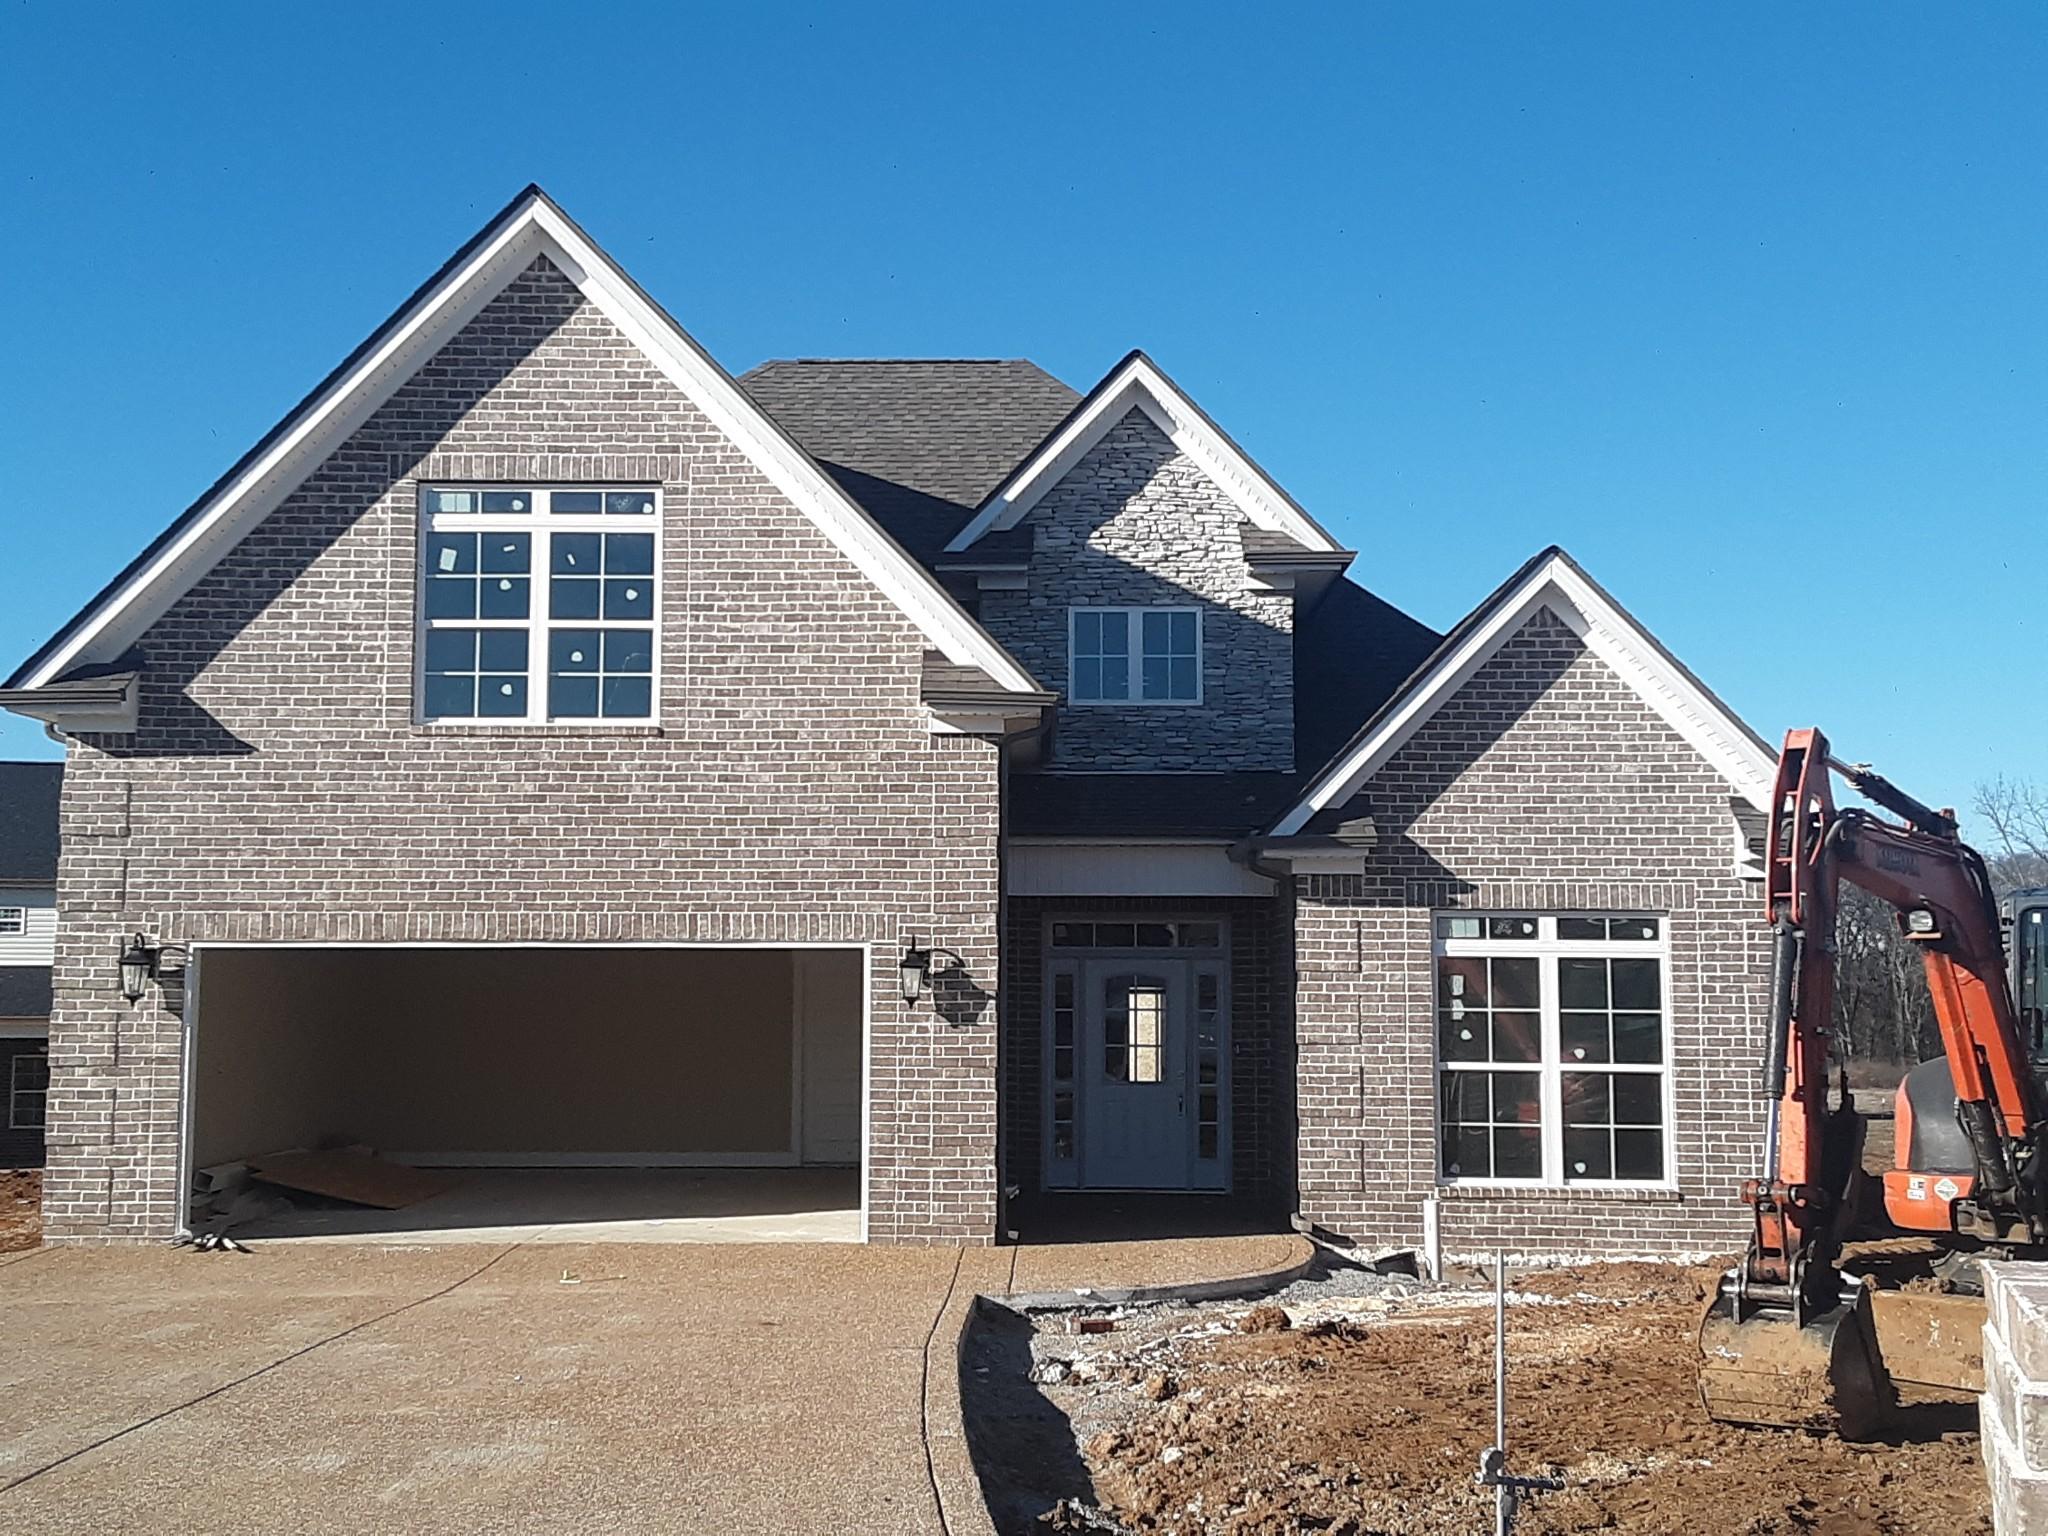 105 Wrangler Ct, Smyrna, TN 37167 - Smyrna, TN real estate listing